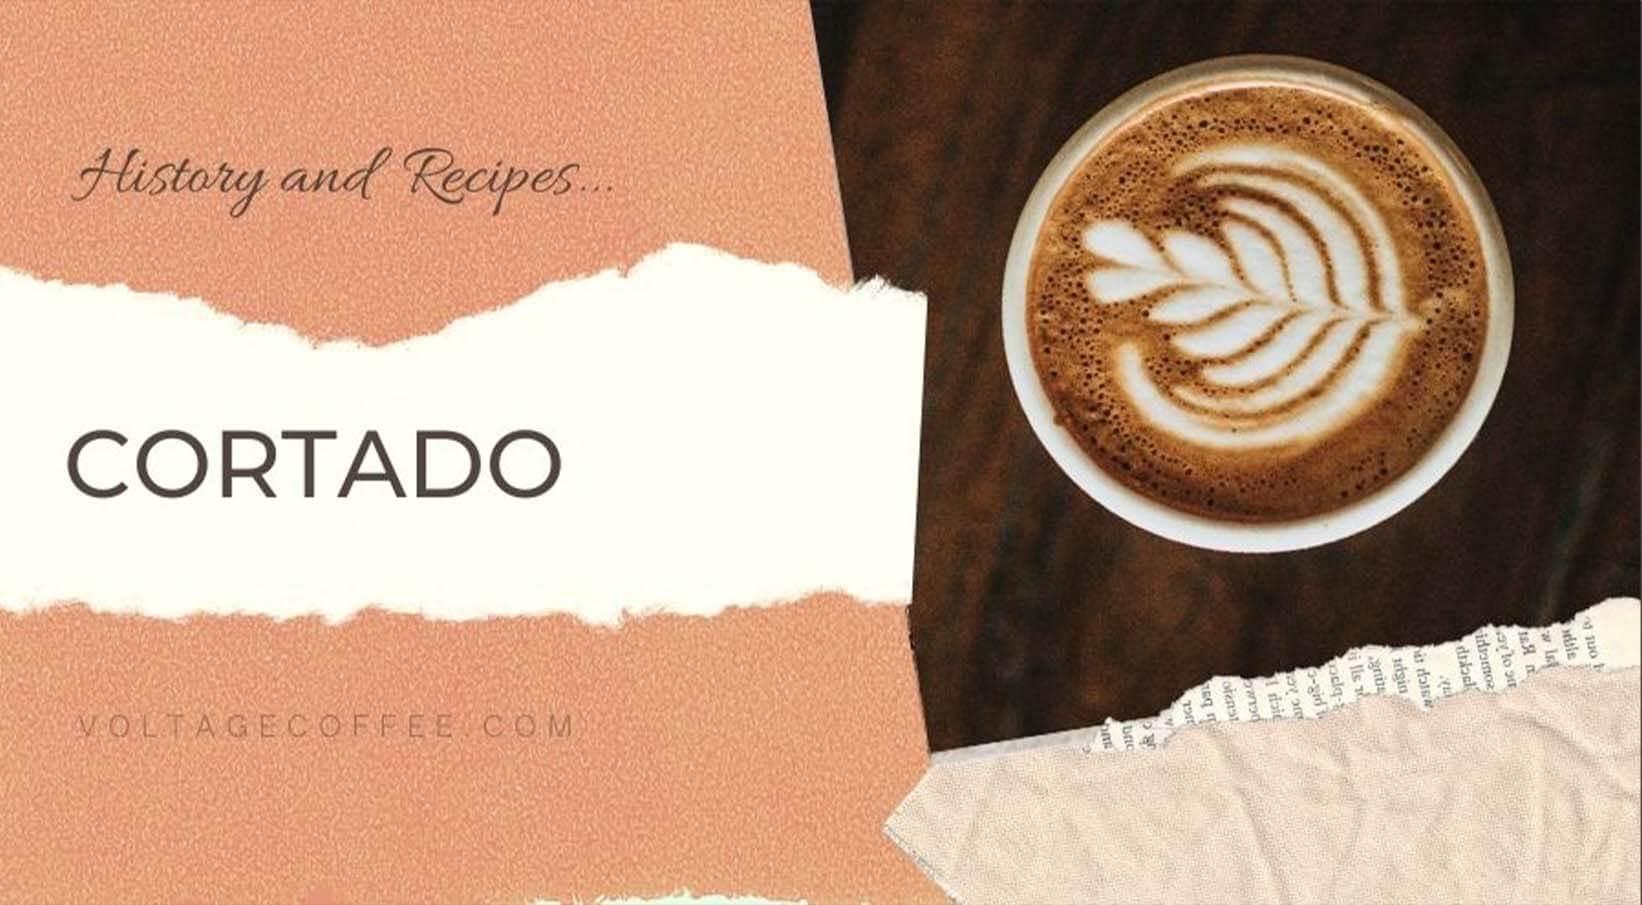 Cortado recipe and history featured image